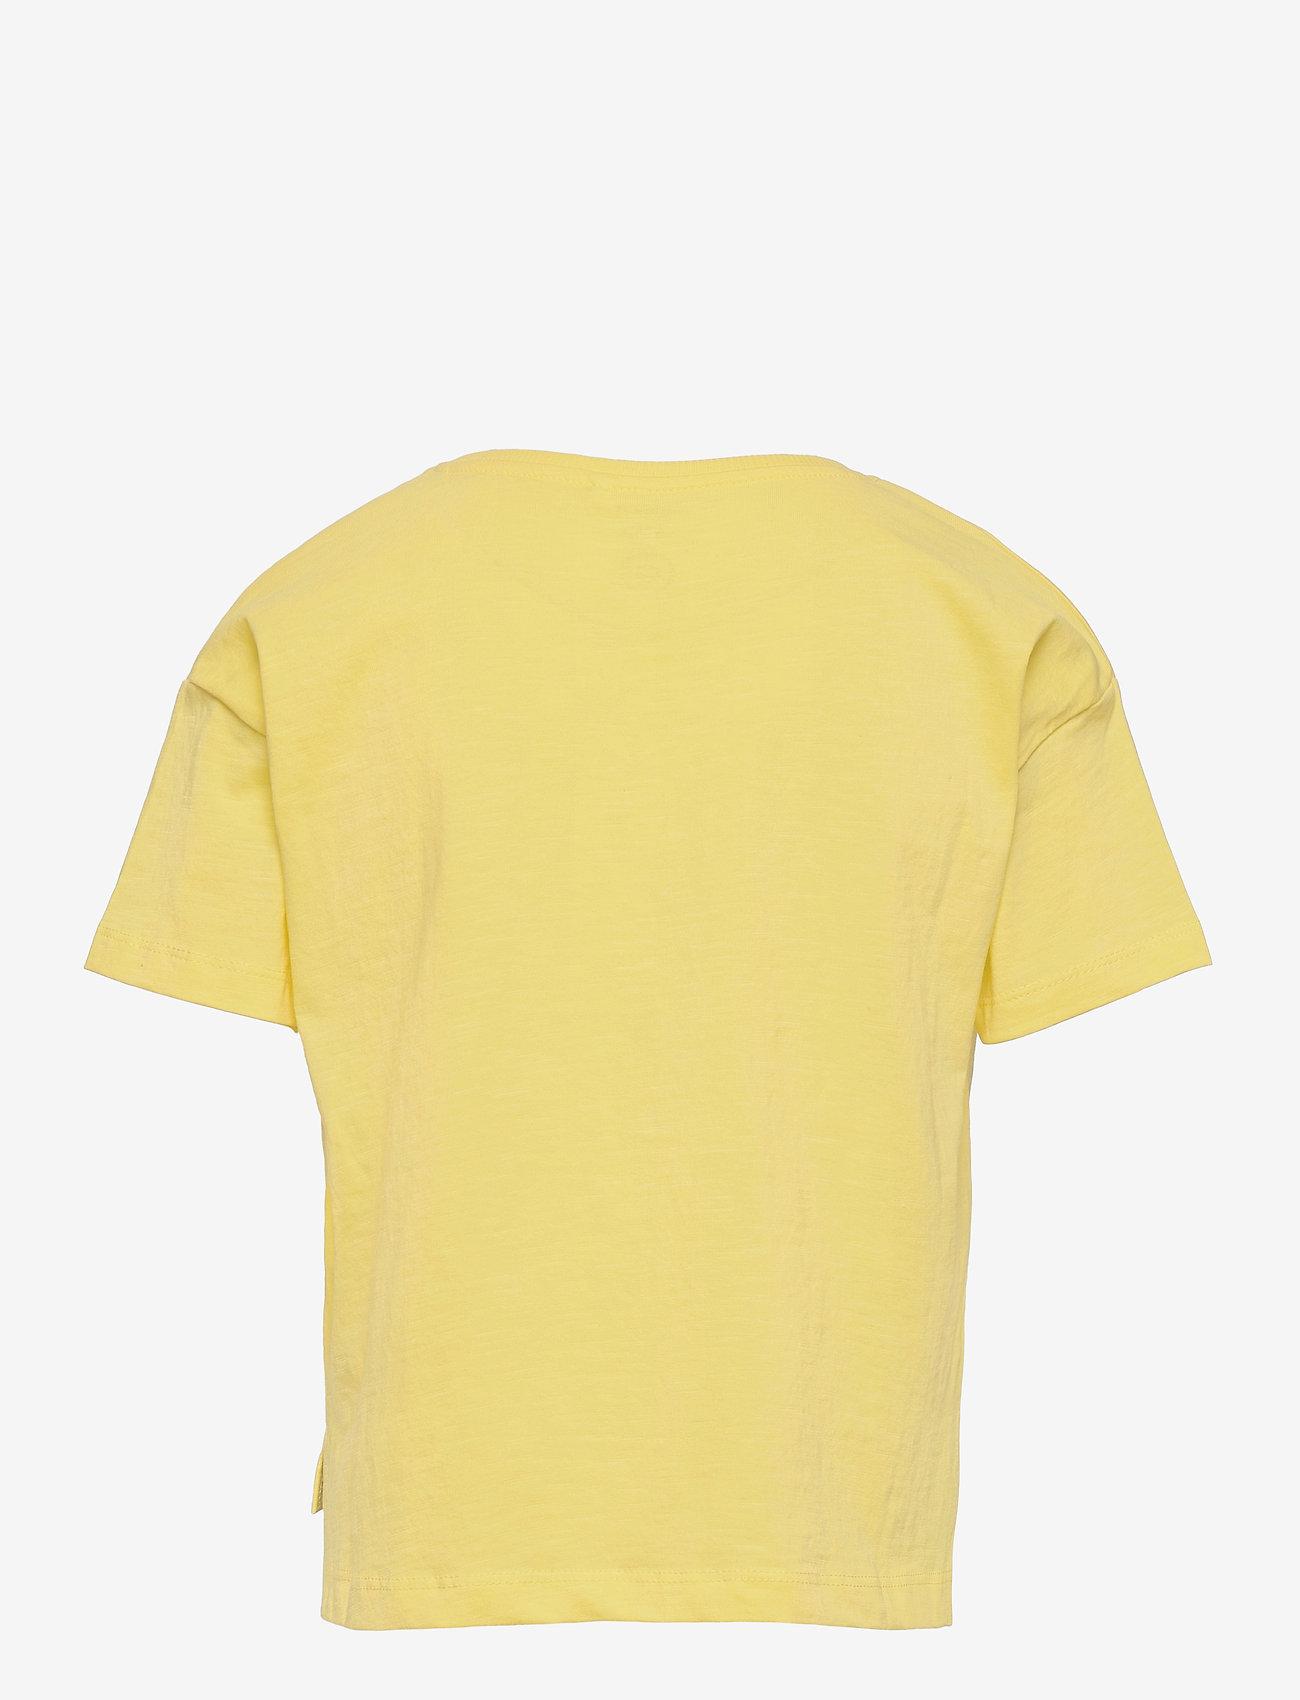 name it - NKFHADIYA SS BOXY TOP - t-shirts - lemon verbena - 1